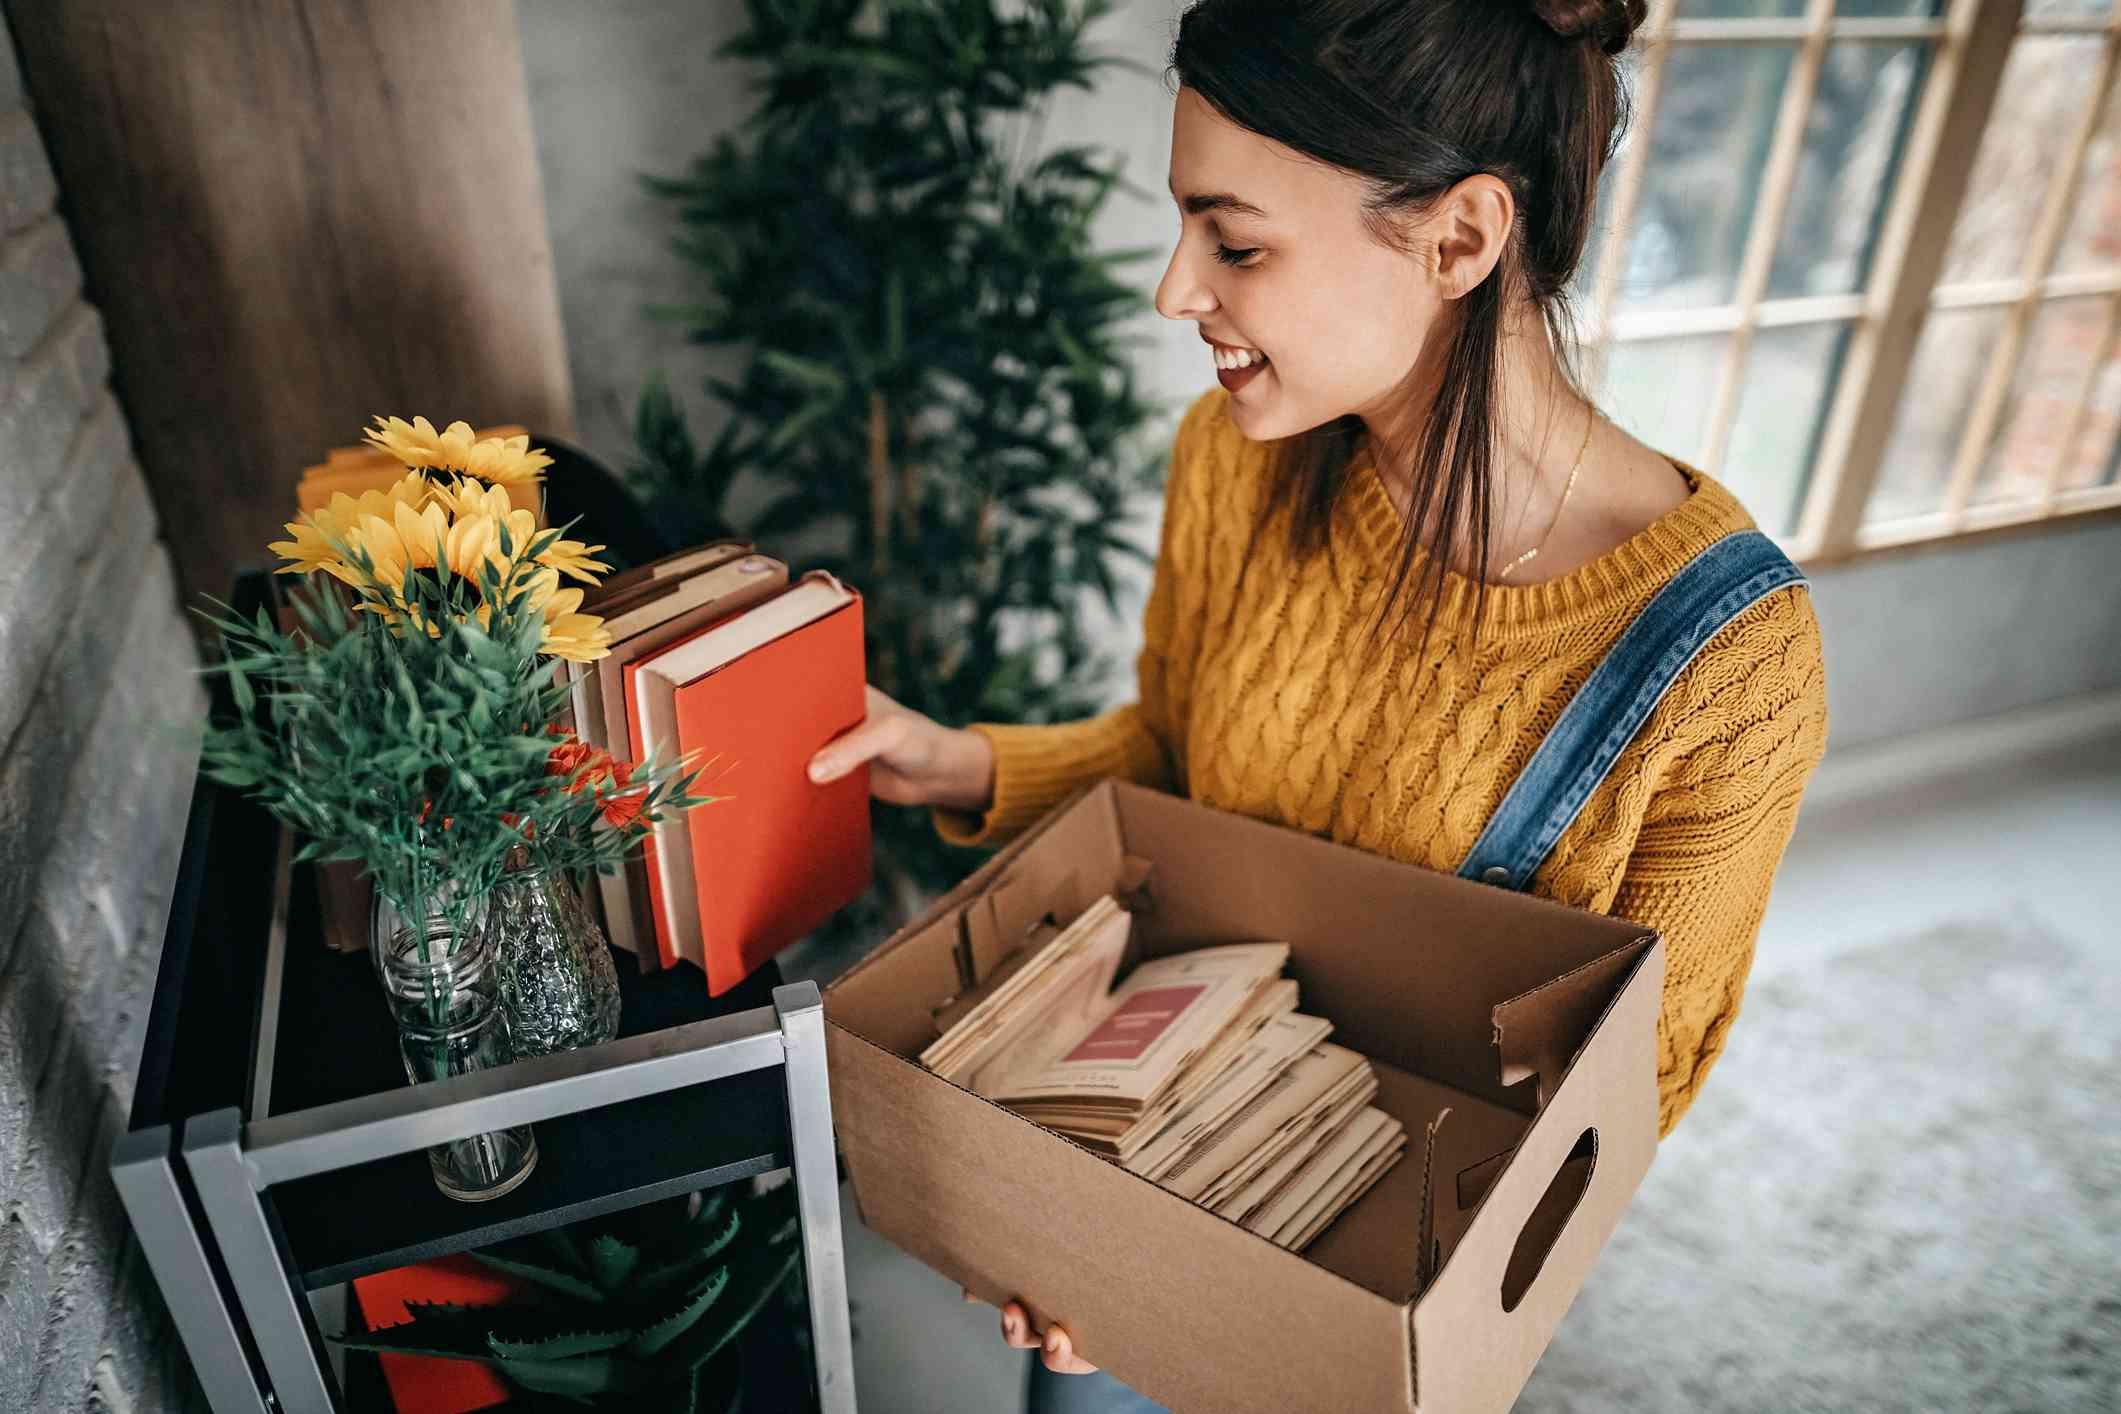 woman with box of stuff